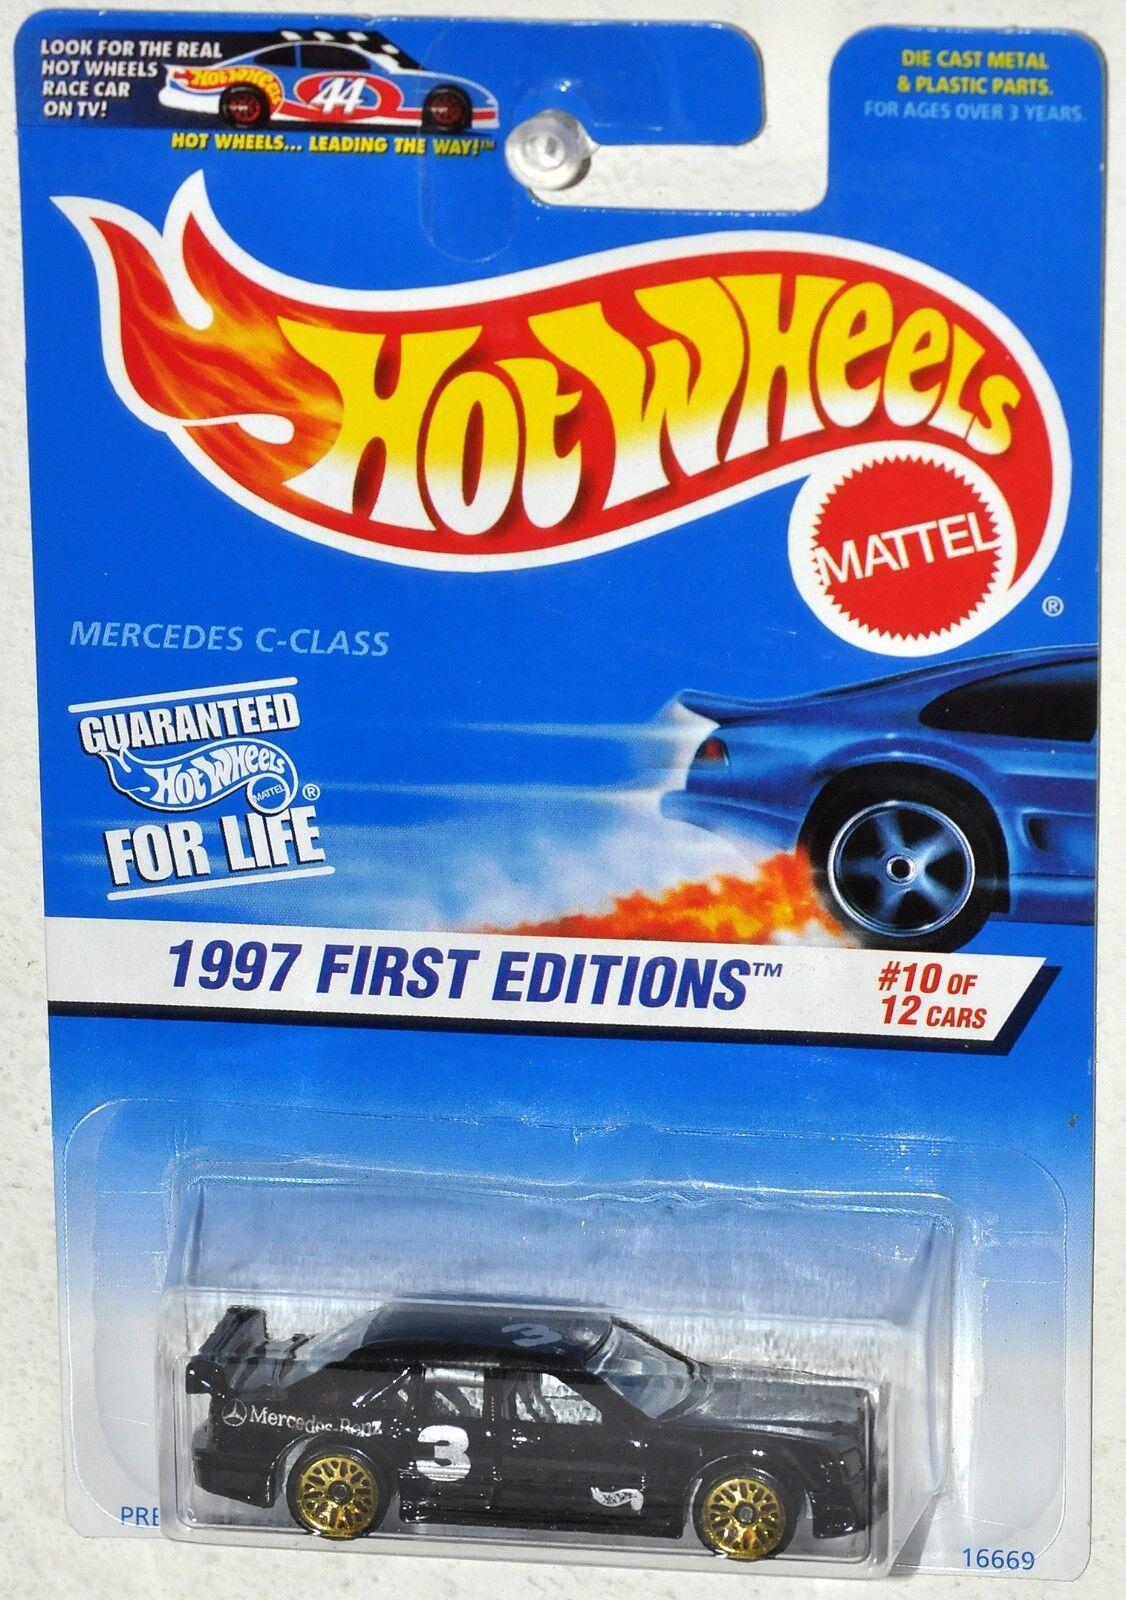 1997 Hotwheels 1st Editions Mercedes C Class Premire Collector Hot Wheels Volkswagen Baja Bug White Tropicool Series Diecast Model 516 Ebay